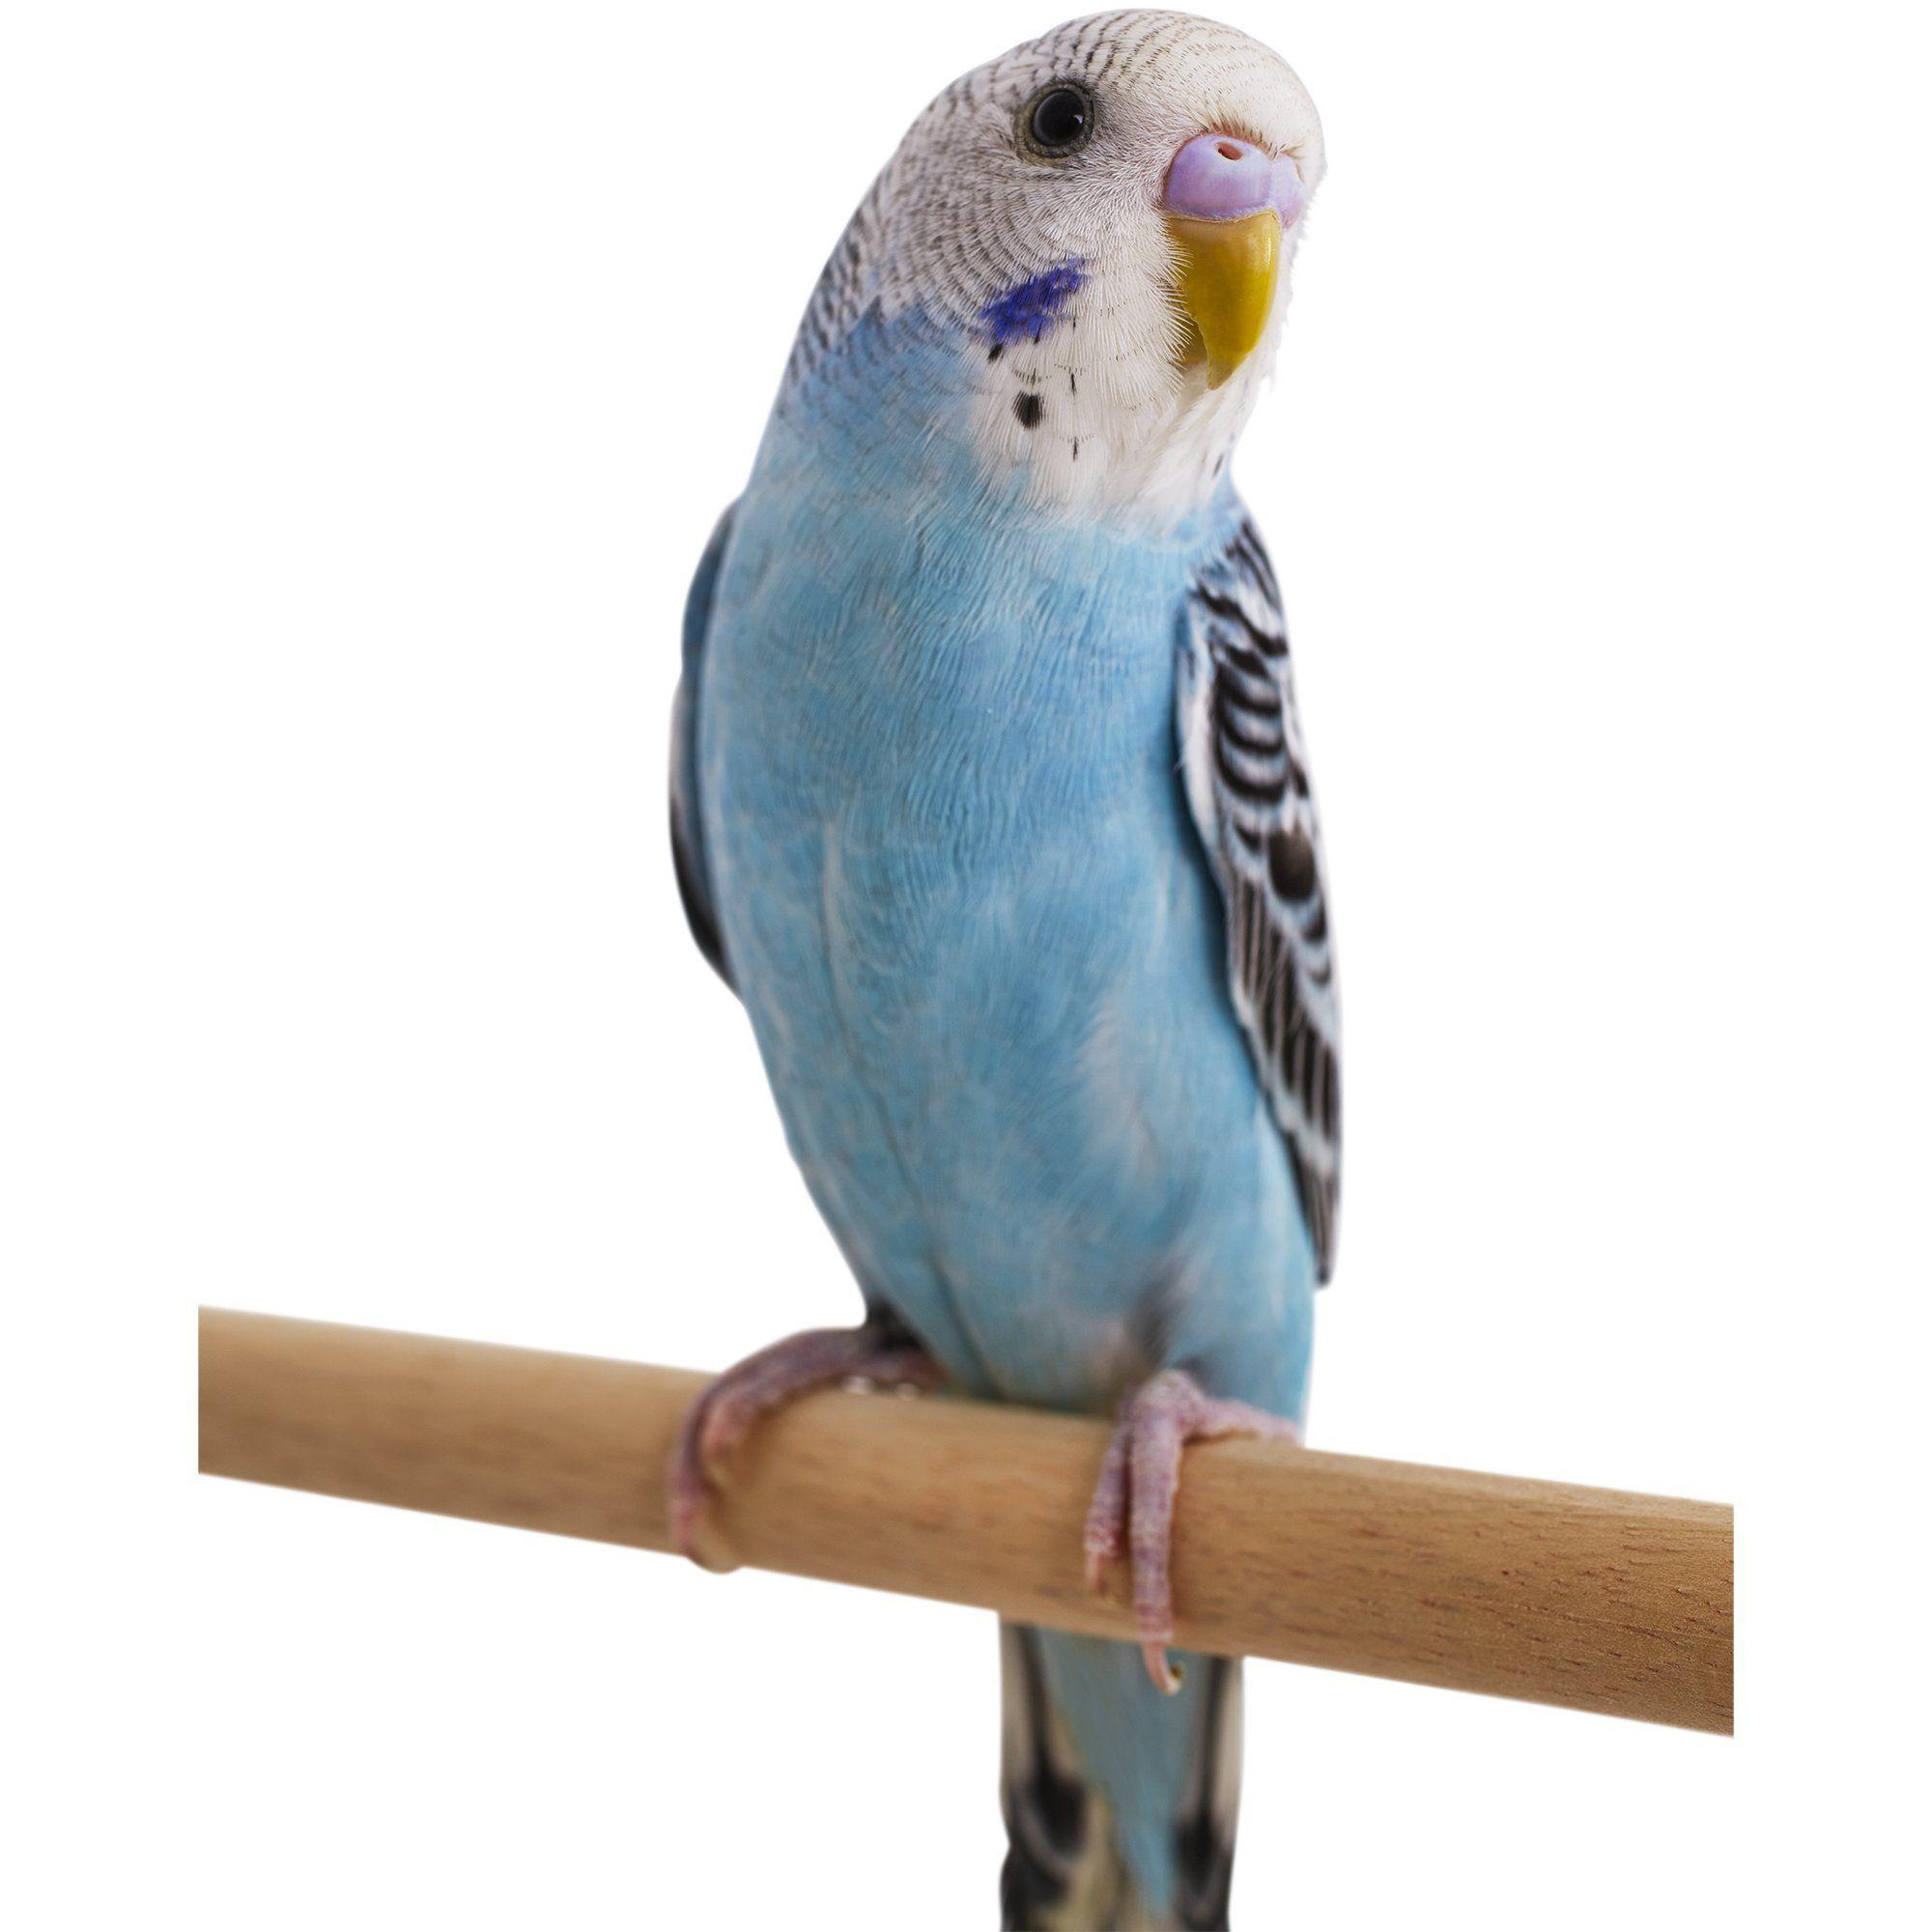 27 HQ Quality Cute Parakeet Photos   Animals   Blue parakeet